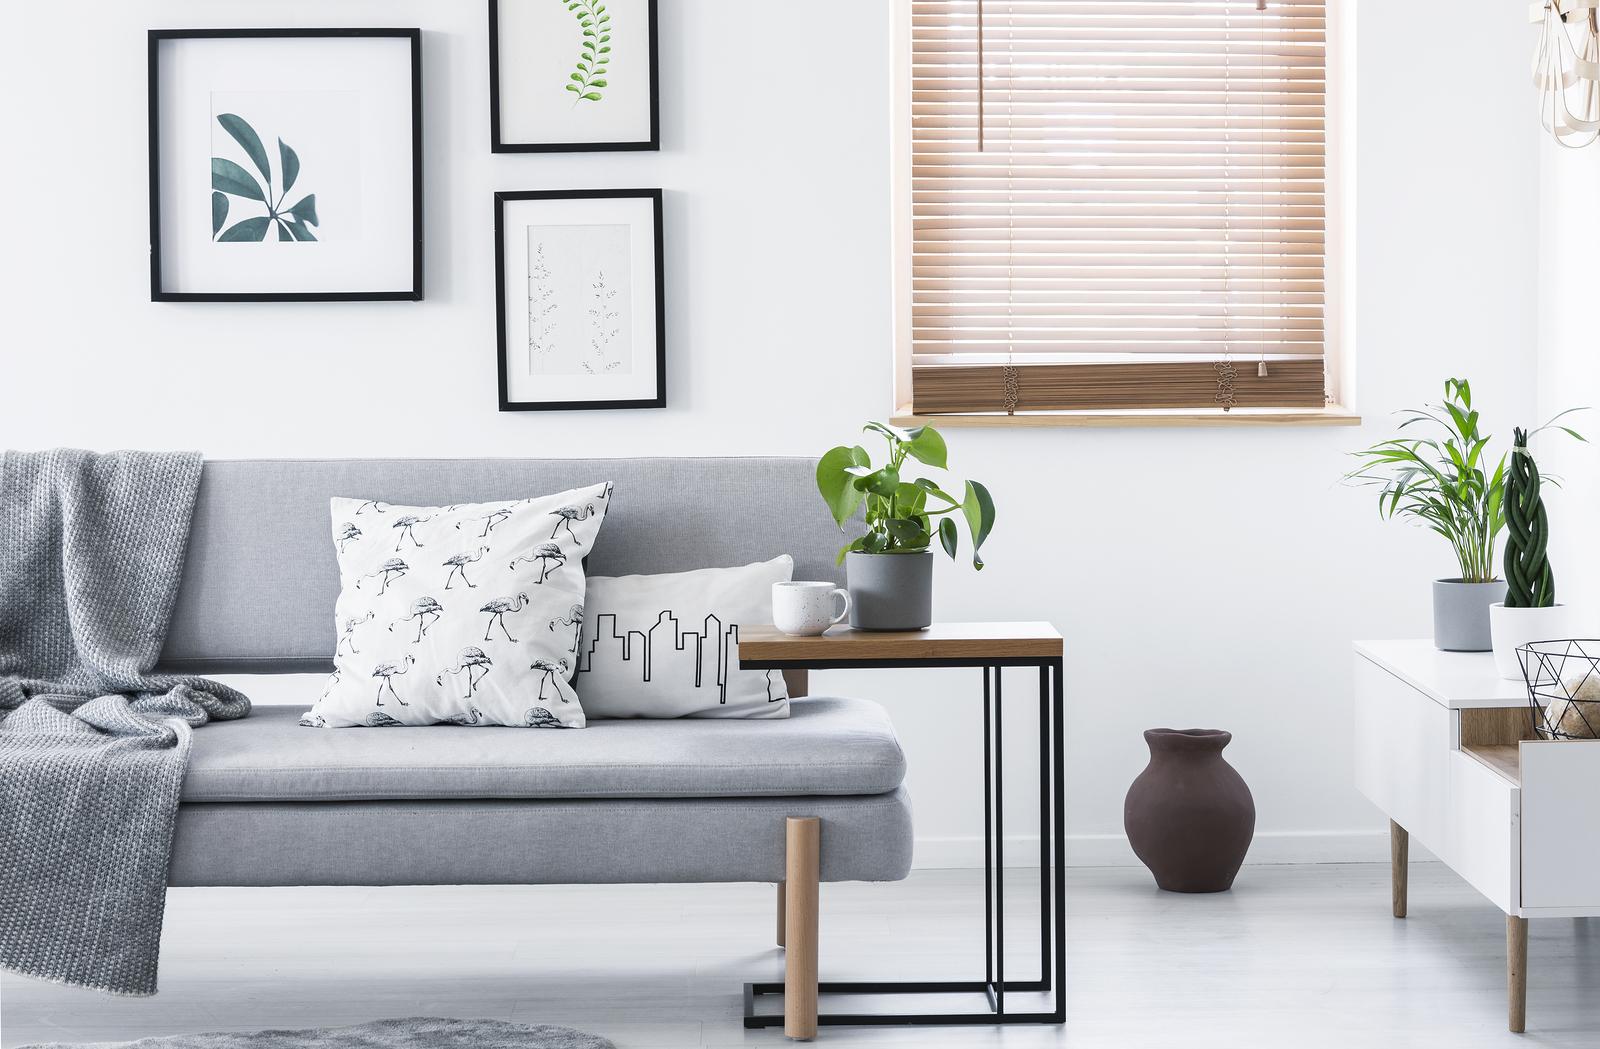 minimalist window couch why go way kuddar met deken echte coxins zdalna domu czyli ochrona smart having kussens laag interior